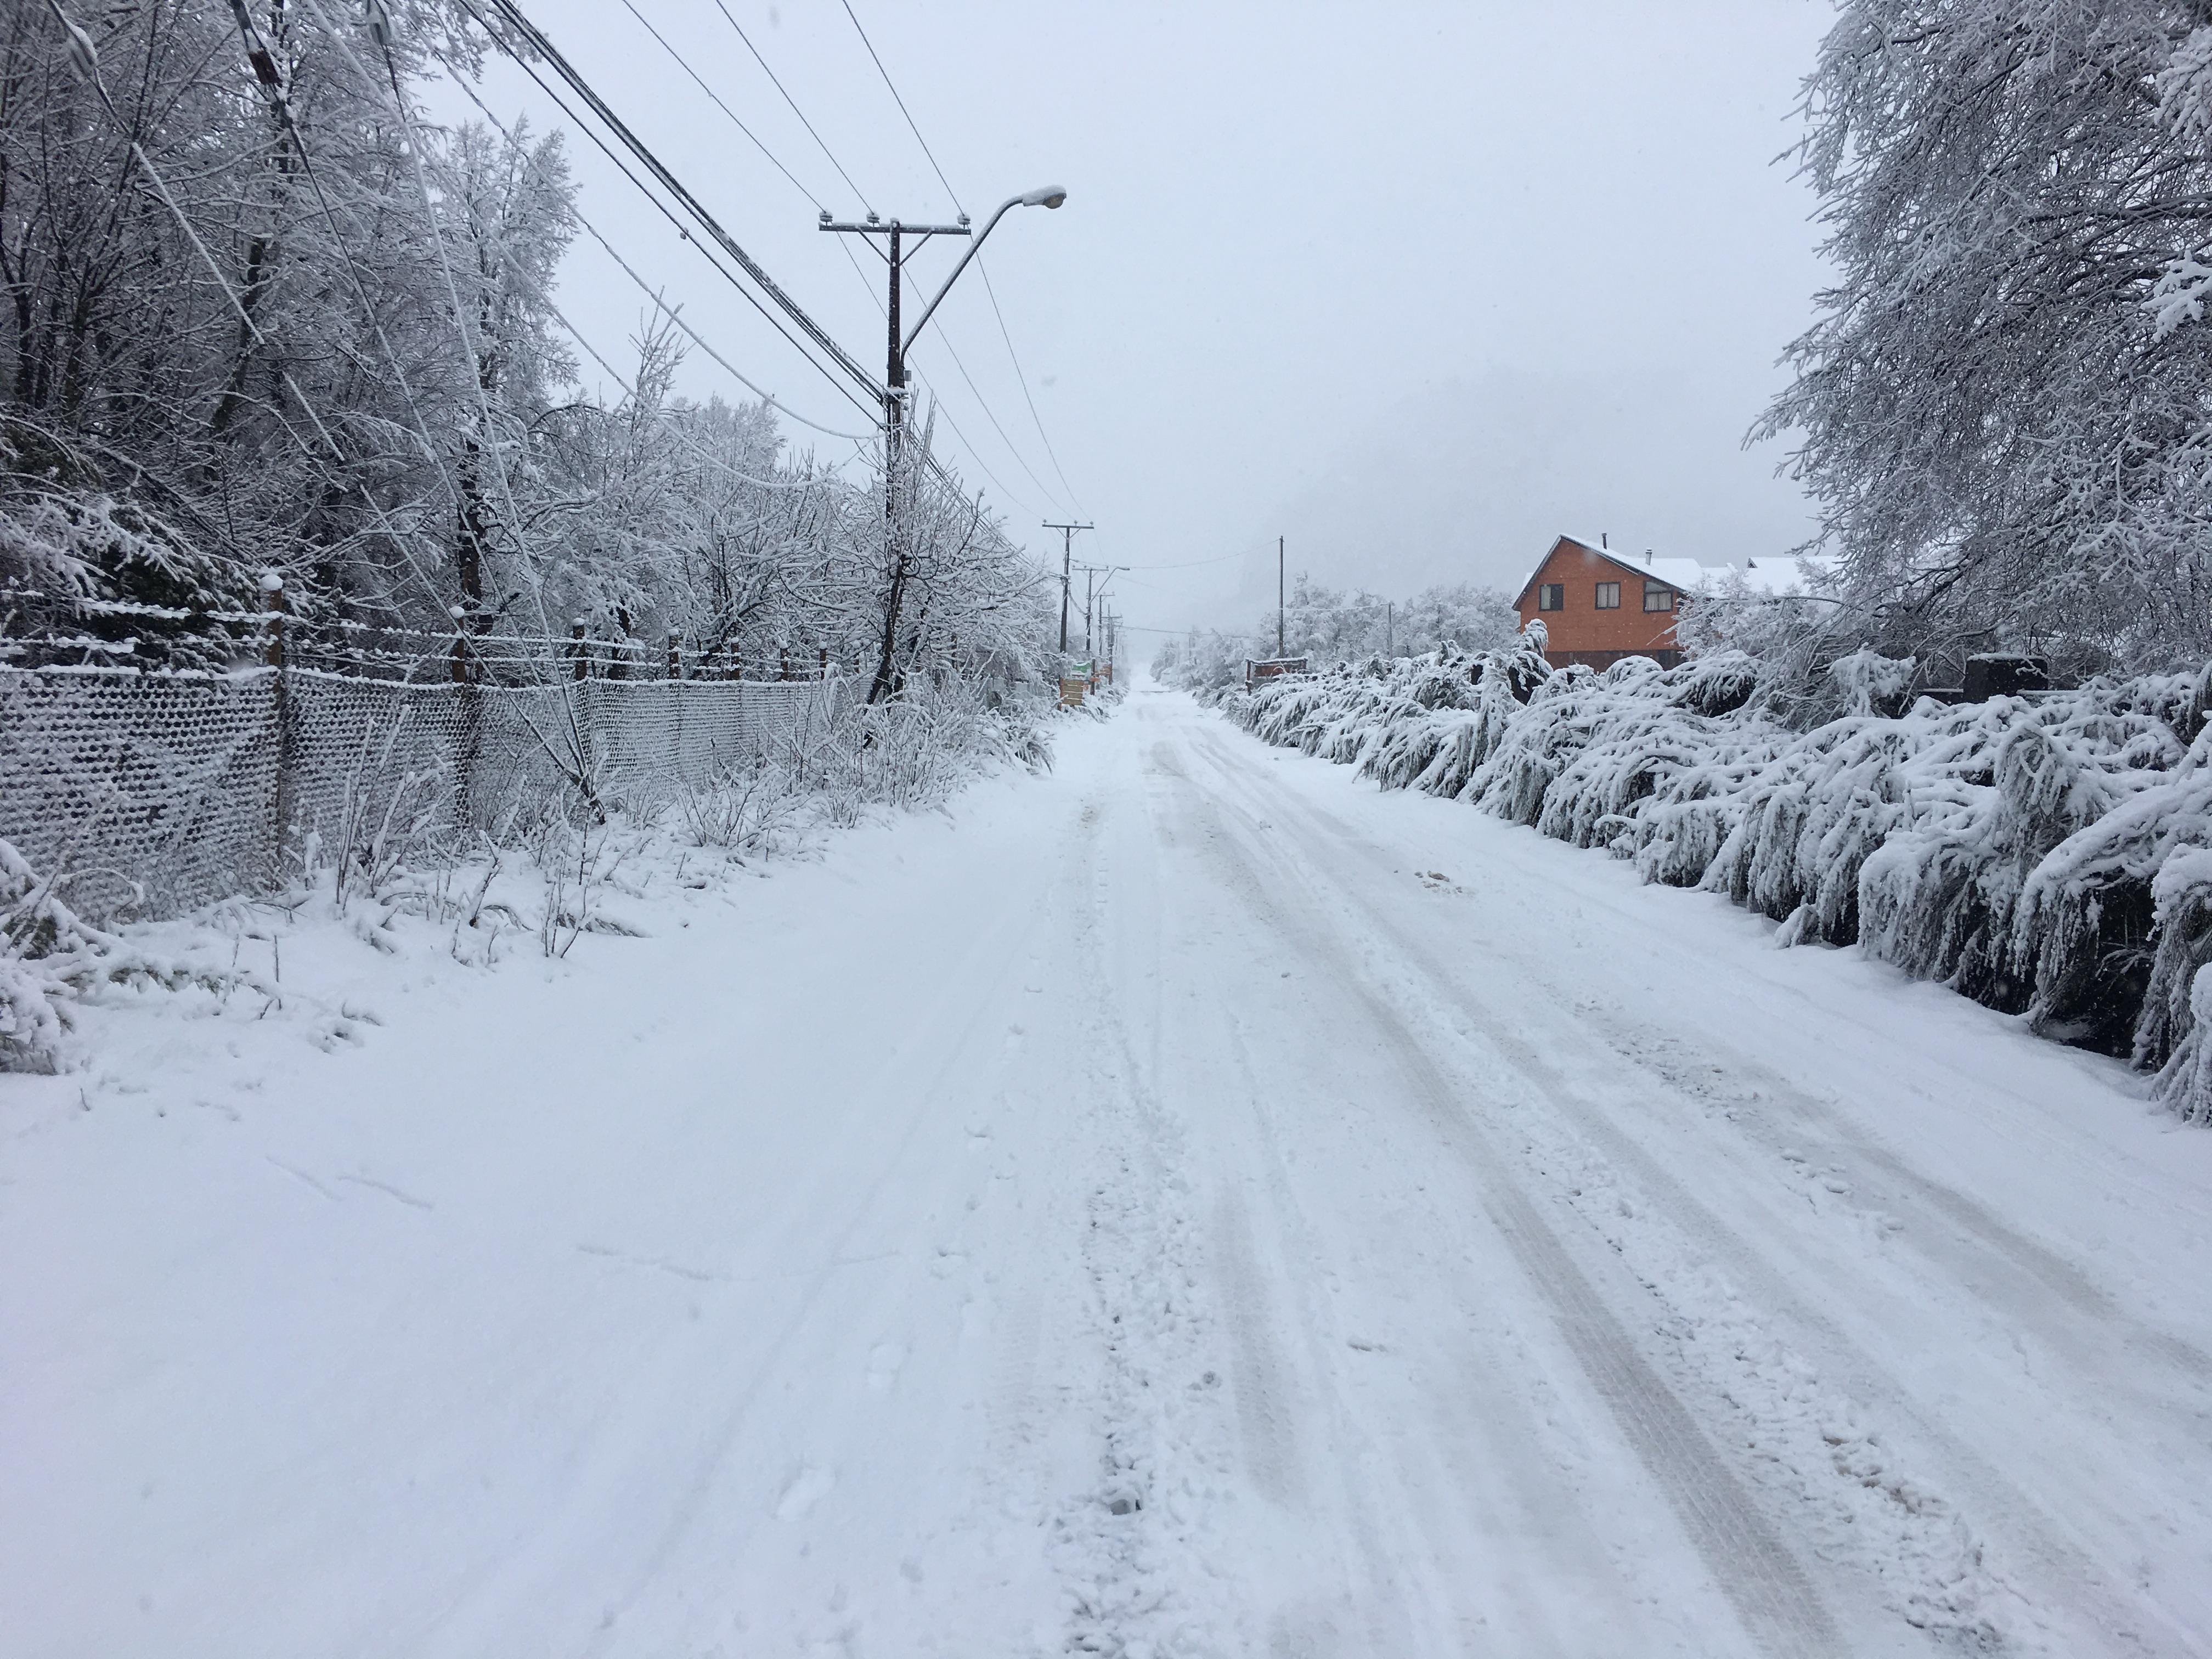 Overnight snow in Chillan, Nevados de Chillan